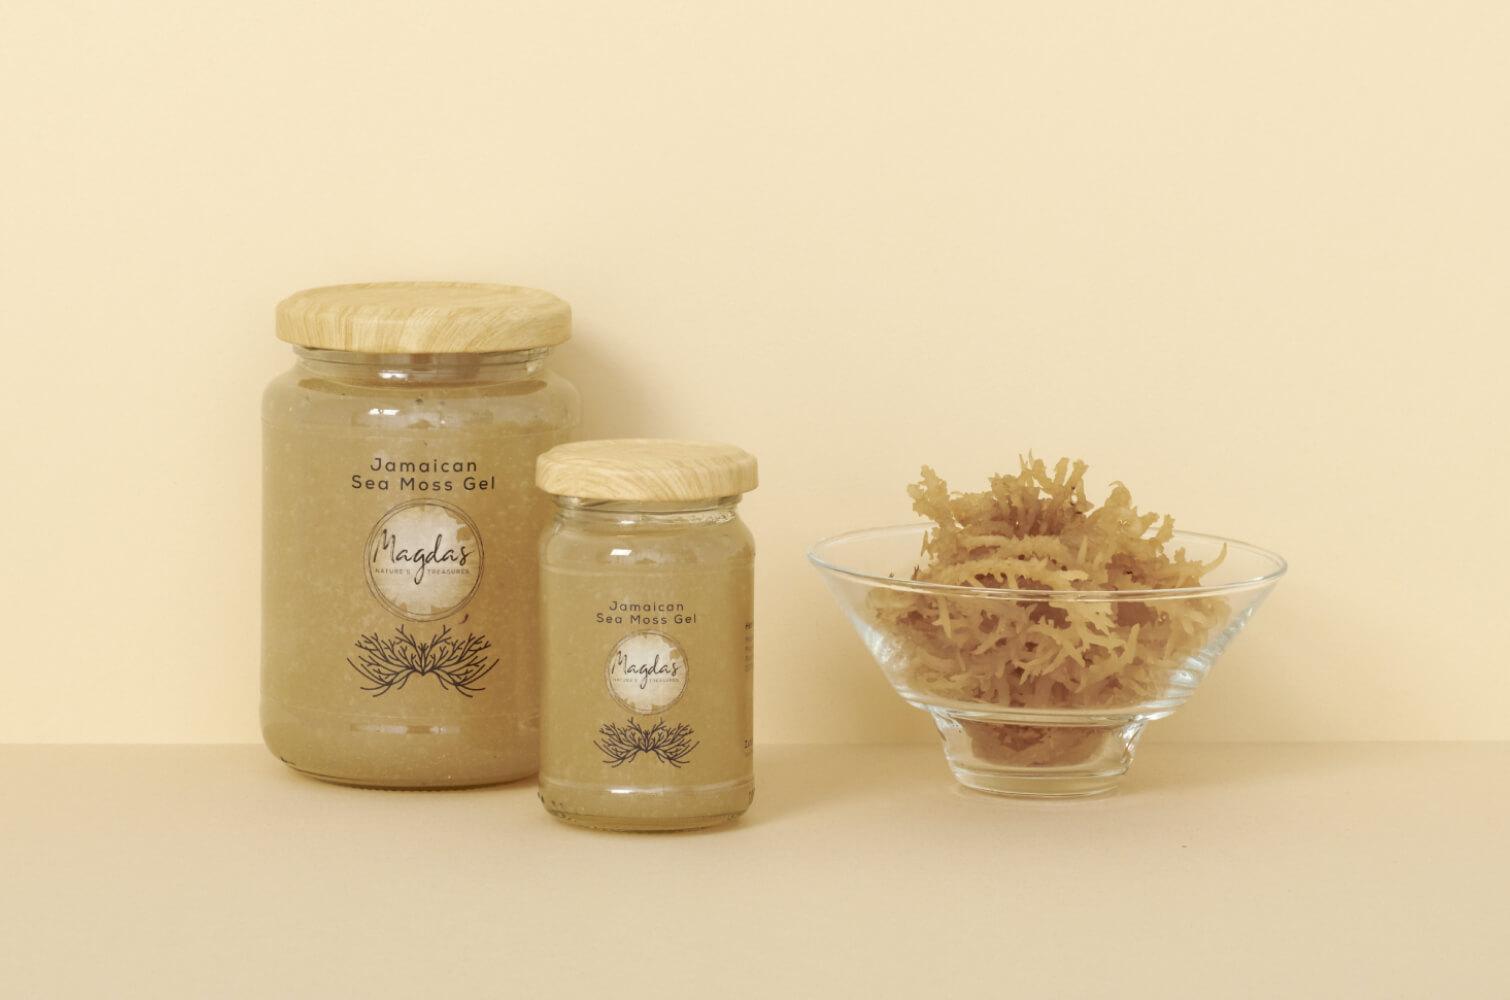 Magdas Natures Treasures - Jamaican Sea Moss Gel Pure + Mini